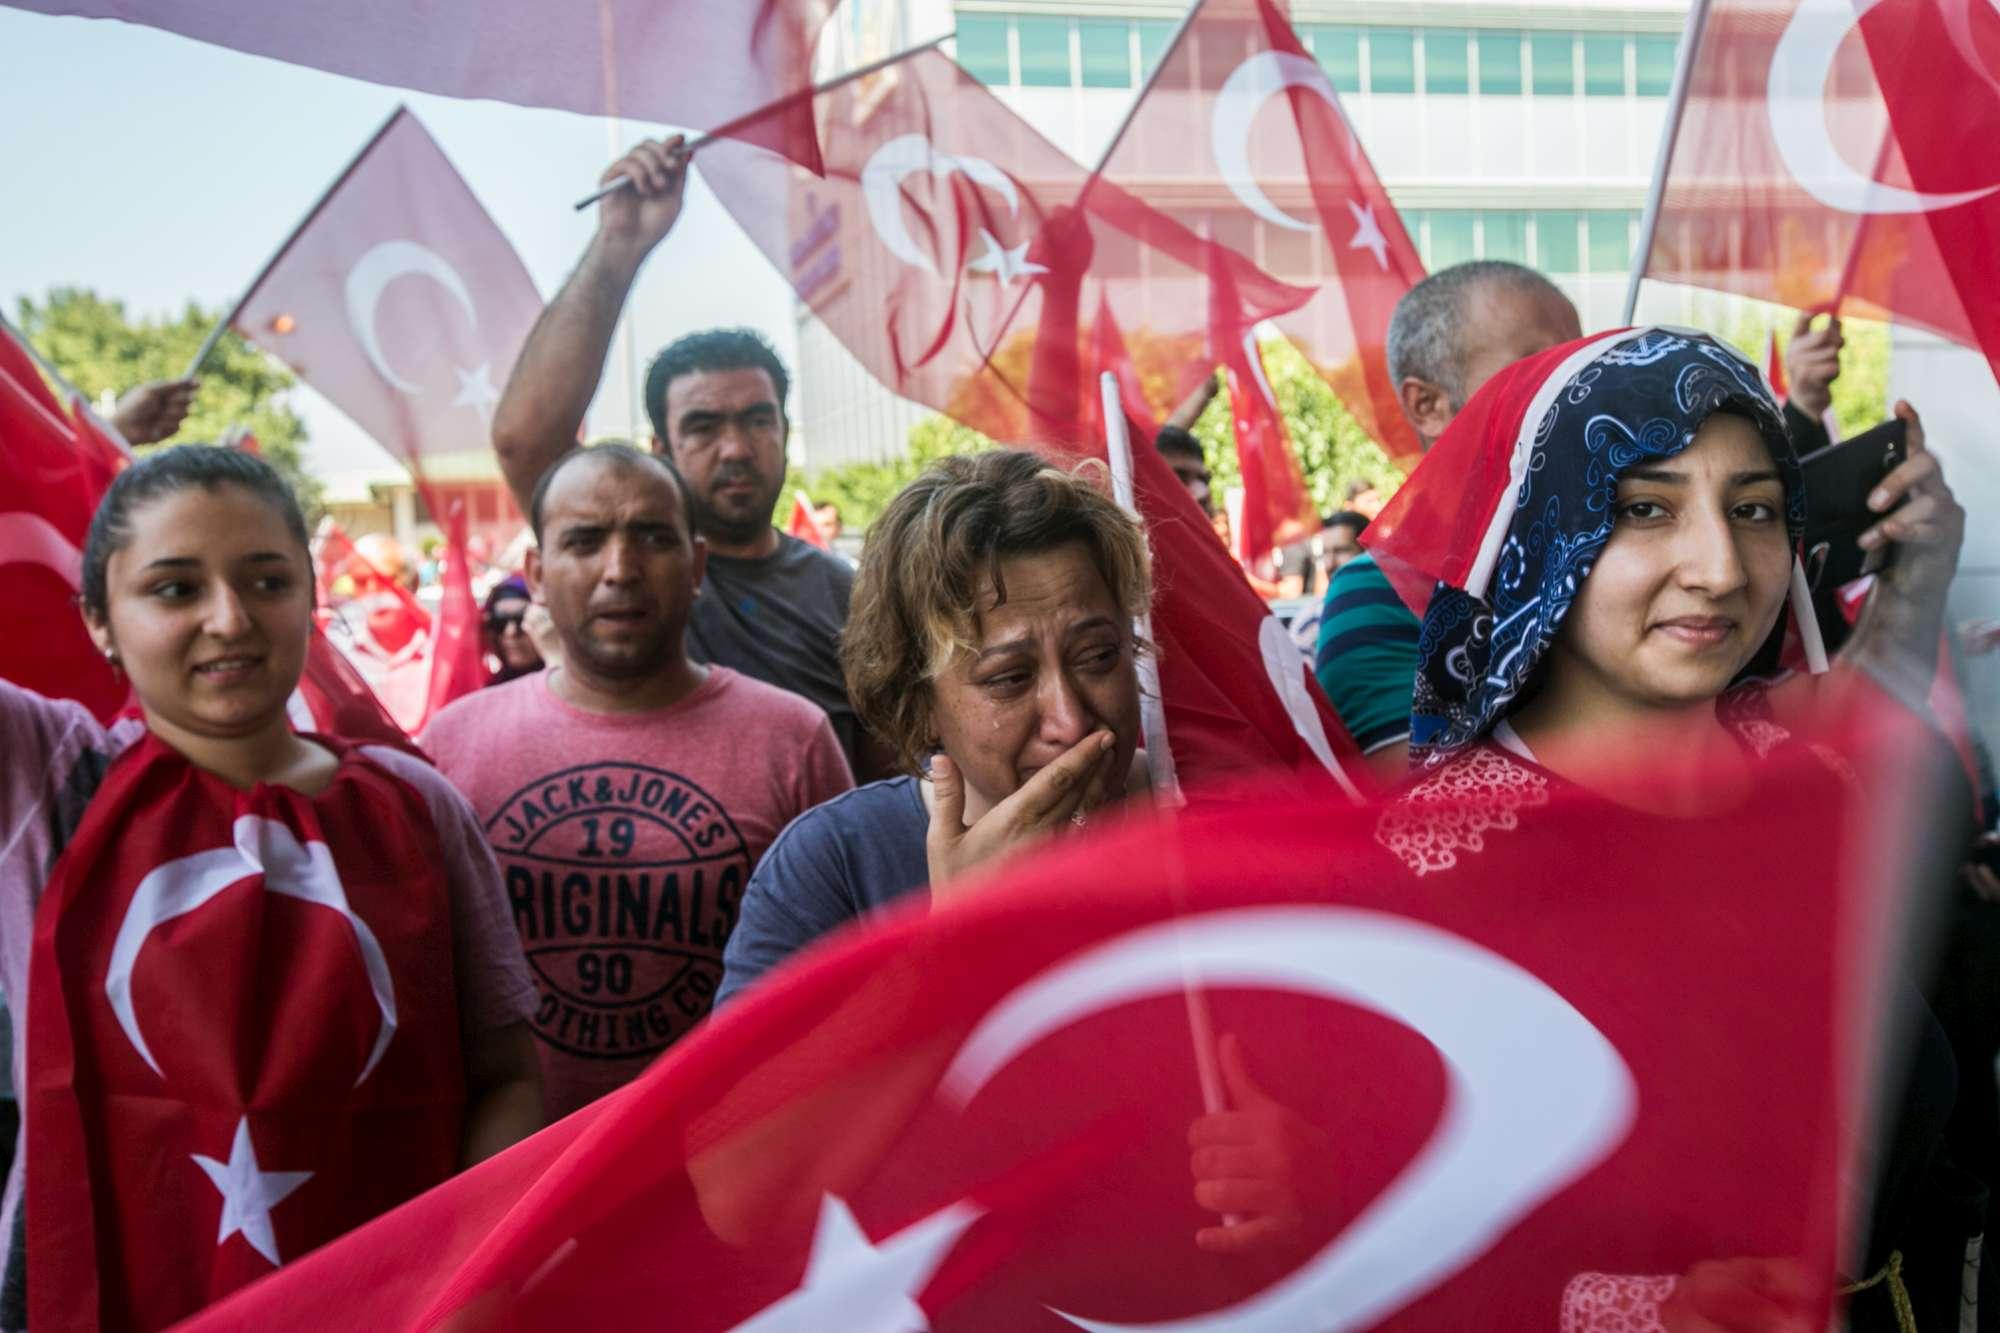 Turchia, fallito il golpe: a Istanbul si festeggia per le strade